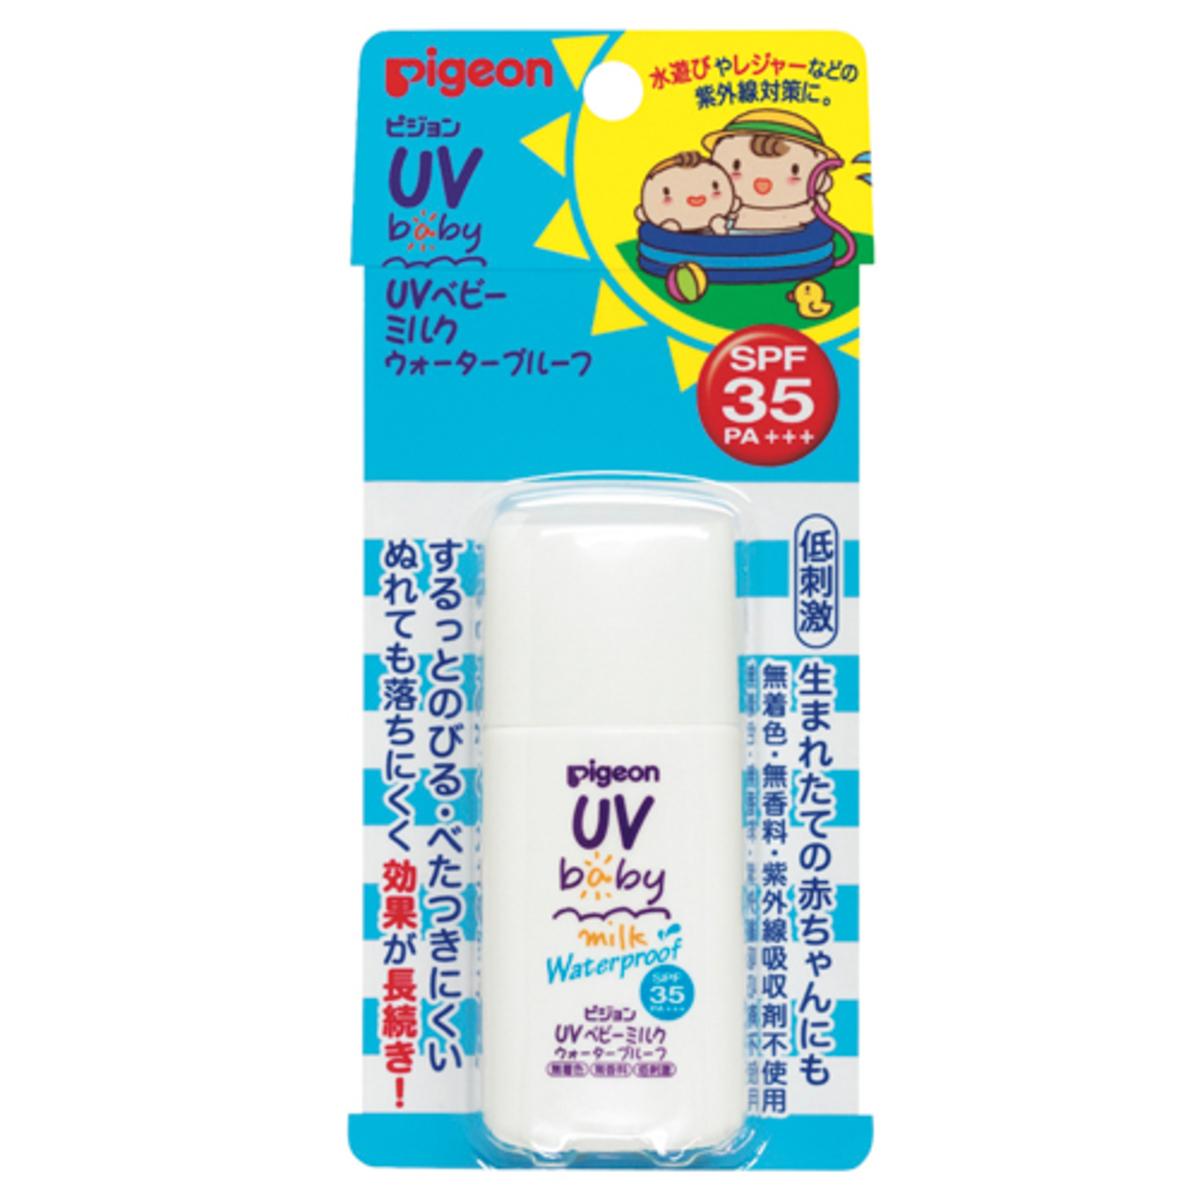 UV Baby Milk Waterproof (SPF35 PA+++) (Parallel Import Product)